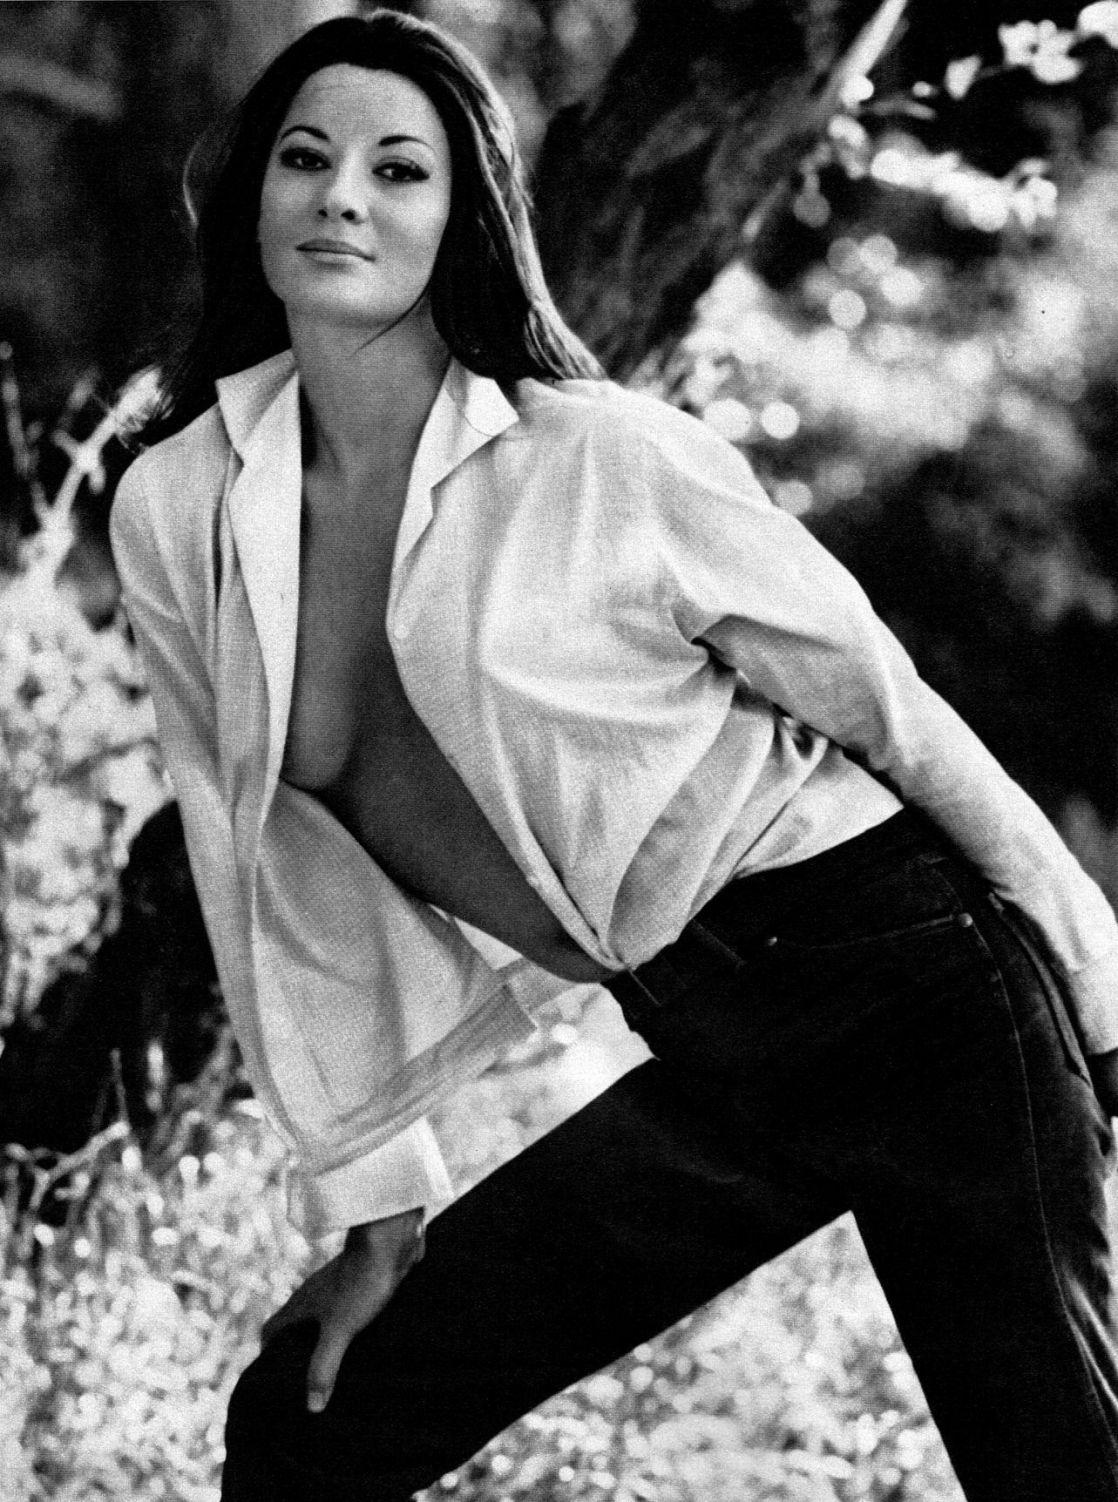 Hot Rosalba Neri nudes (14 pictures) Hot, iCloud, braless